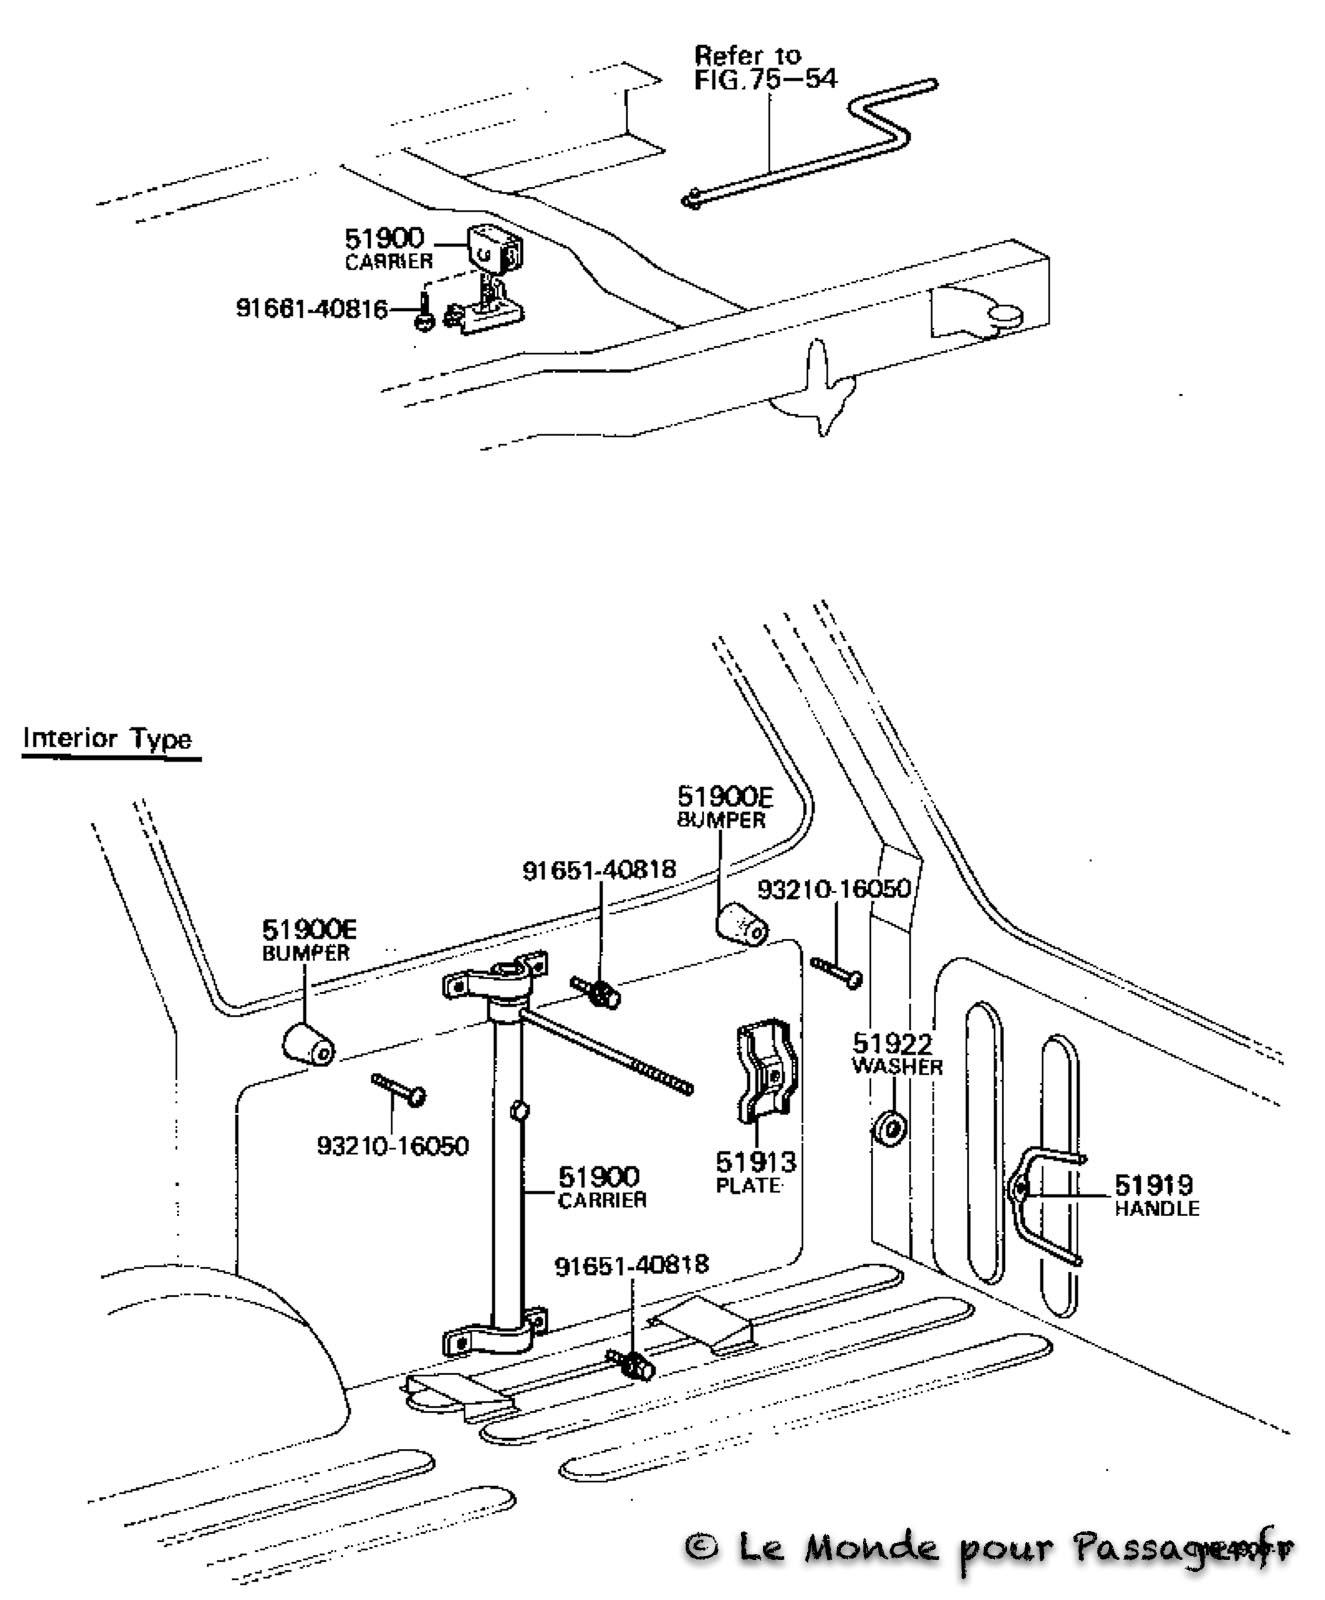 Fj55-Eclatés-Techniques022